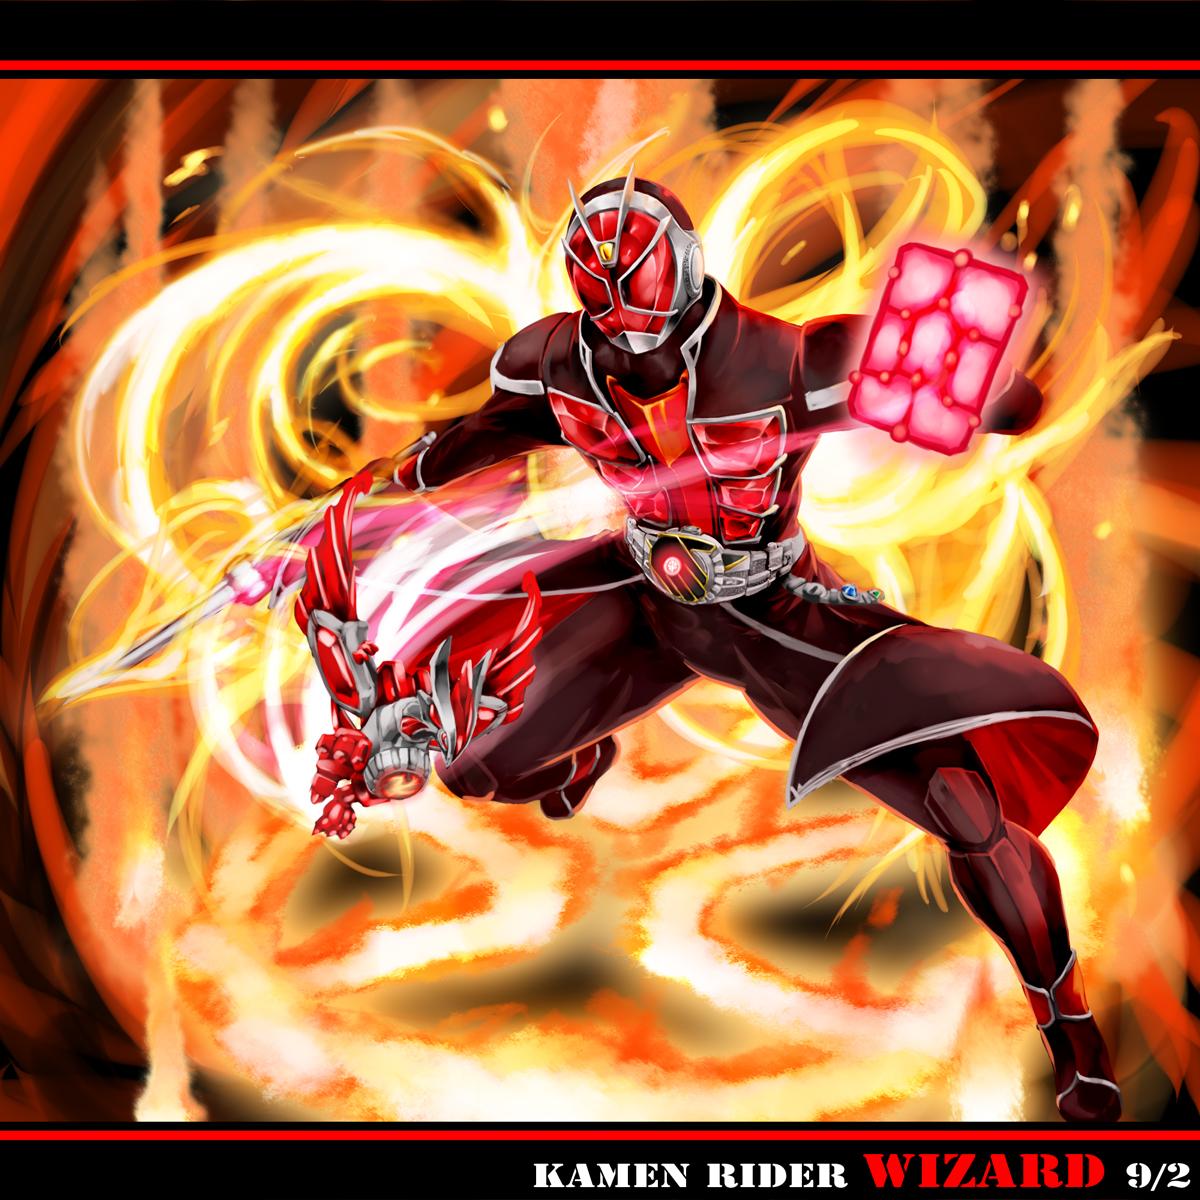 Kamen Rider Wizard Red 2 Fav Kamen Rider Wizard